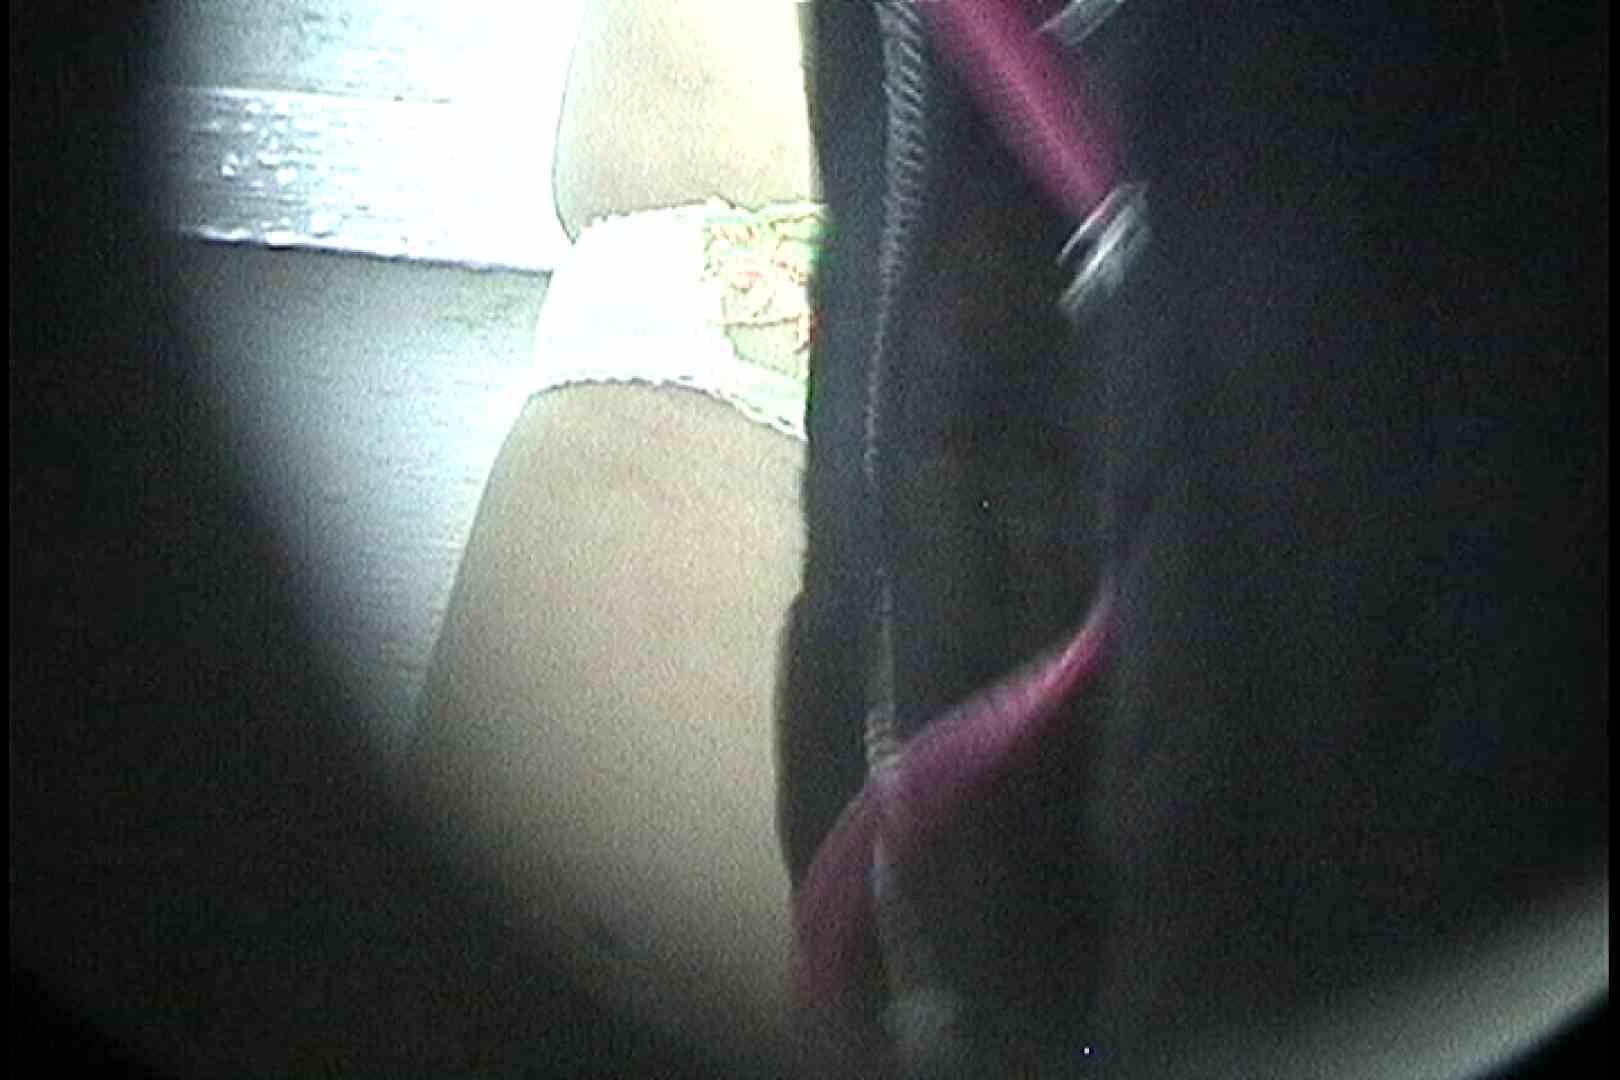 No.24 ビキニの割には陰毛は獰猛、ハミ毛が心配 0  104連発 96